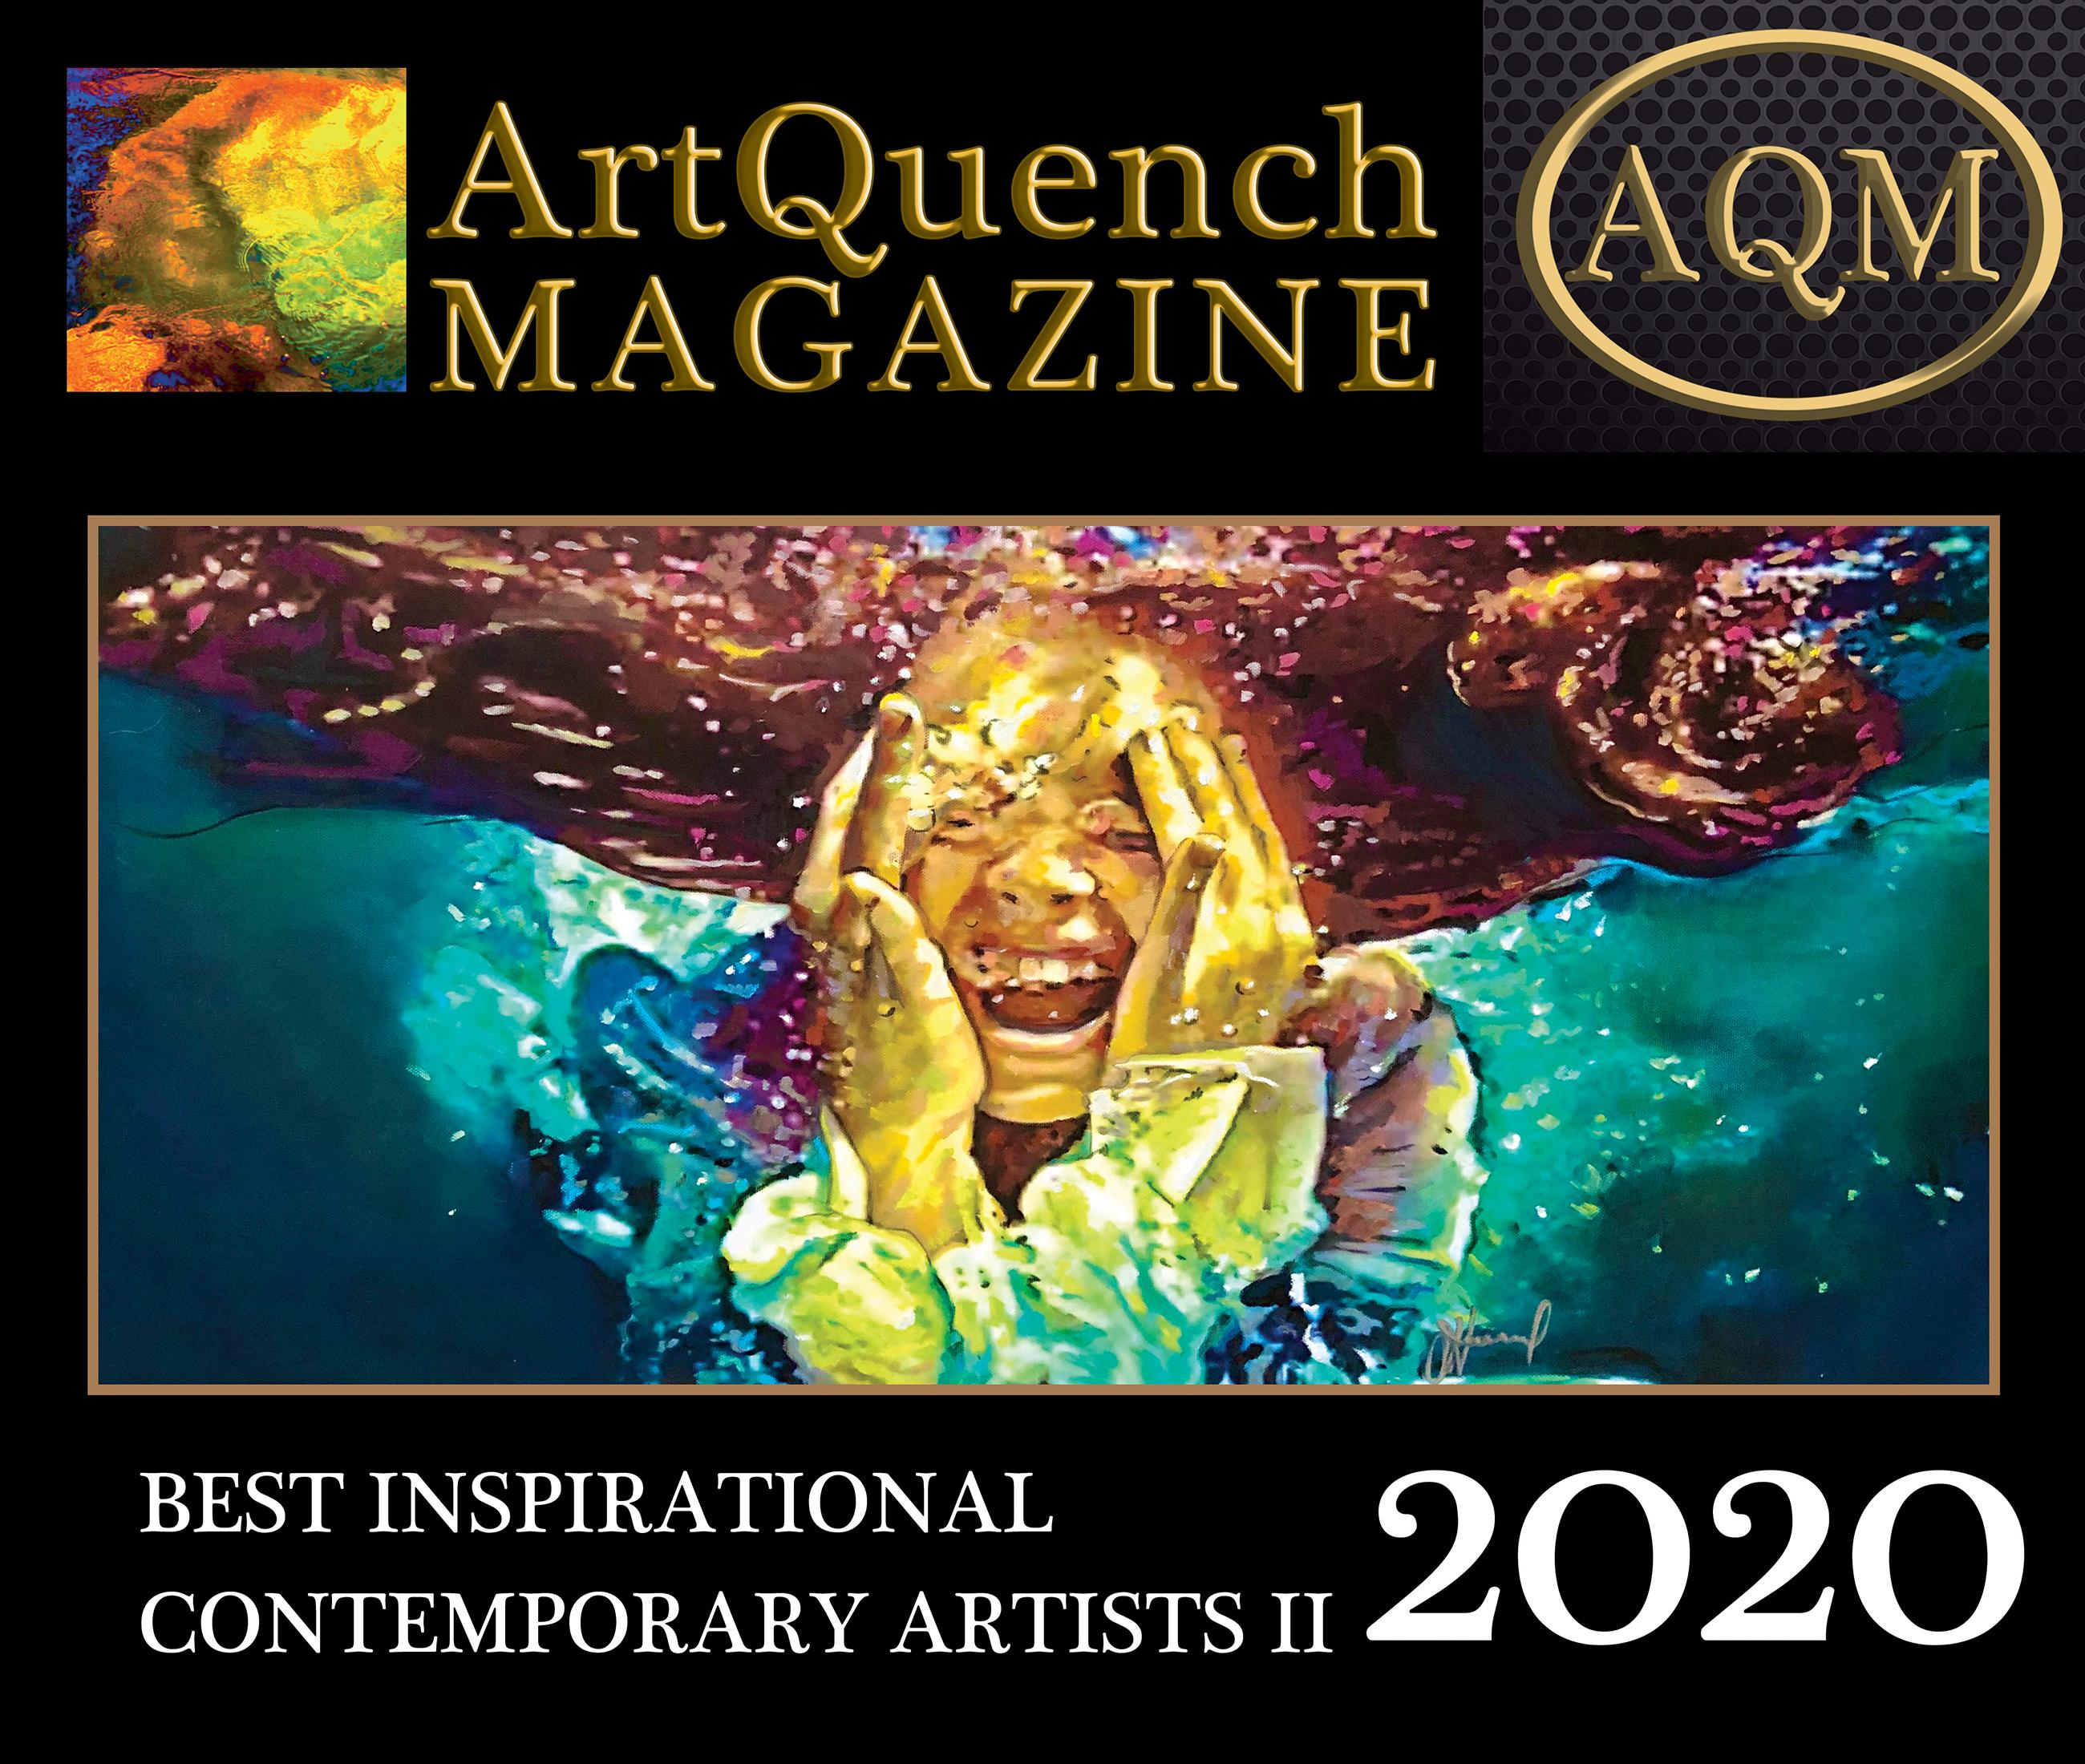 ArtQuench Magazine AQM Best Inspirational Contemporary Artists II 2020 Cover winner Julie Howard